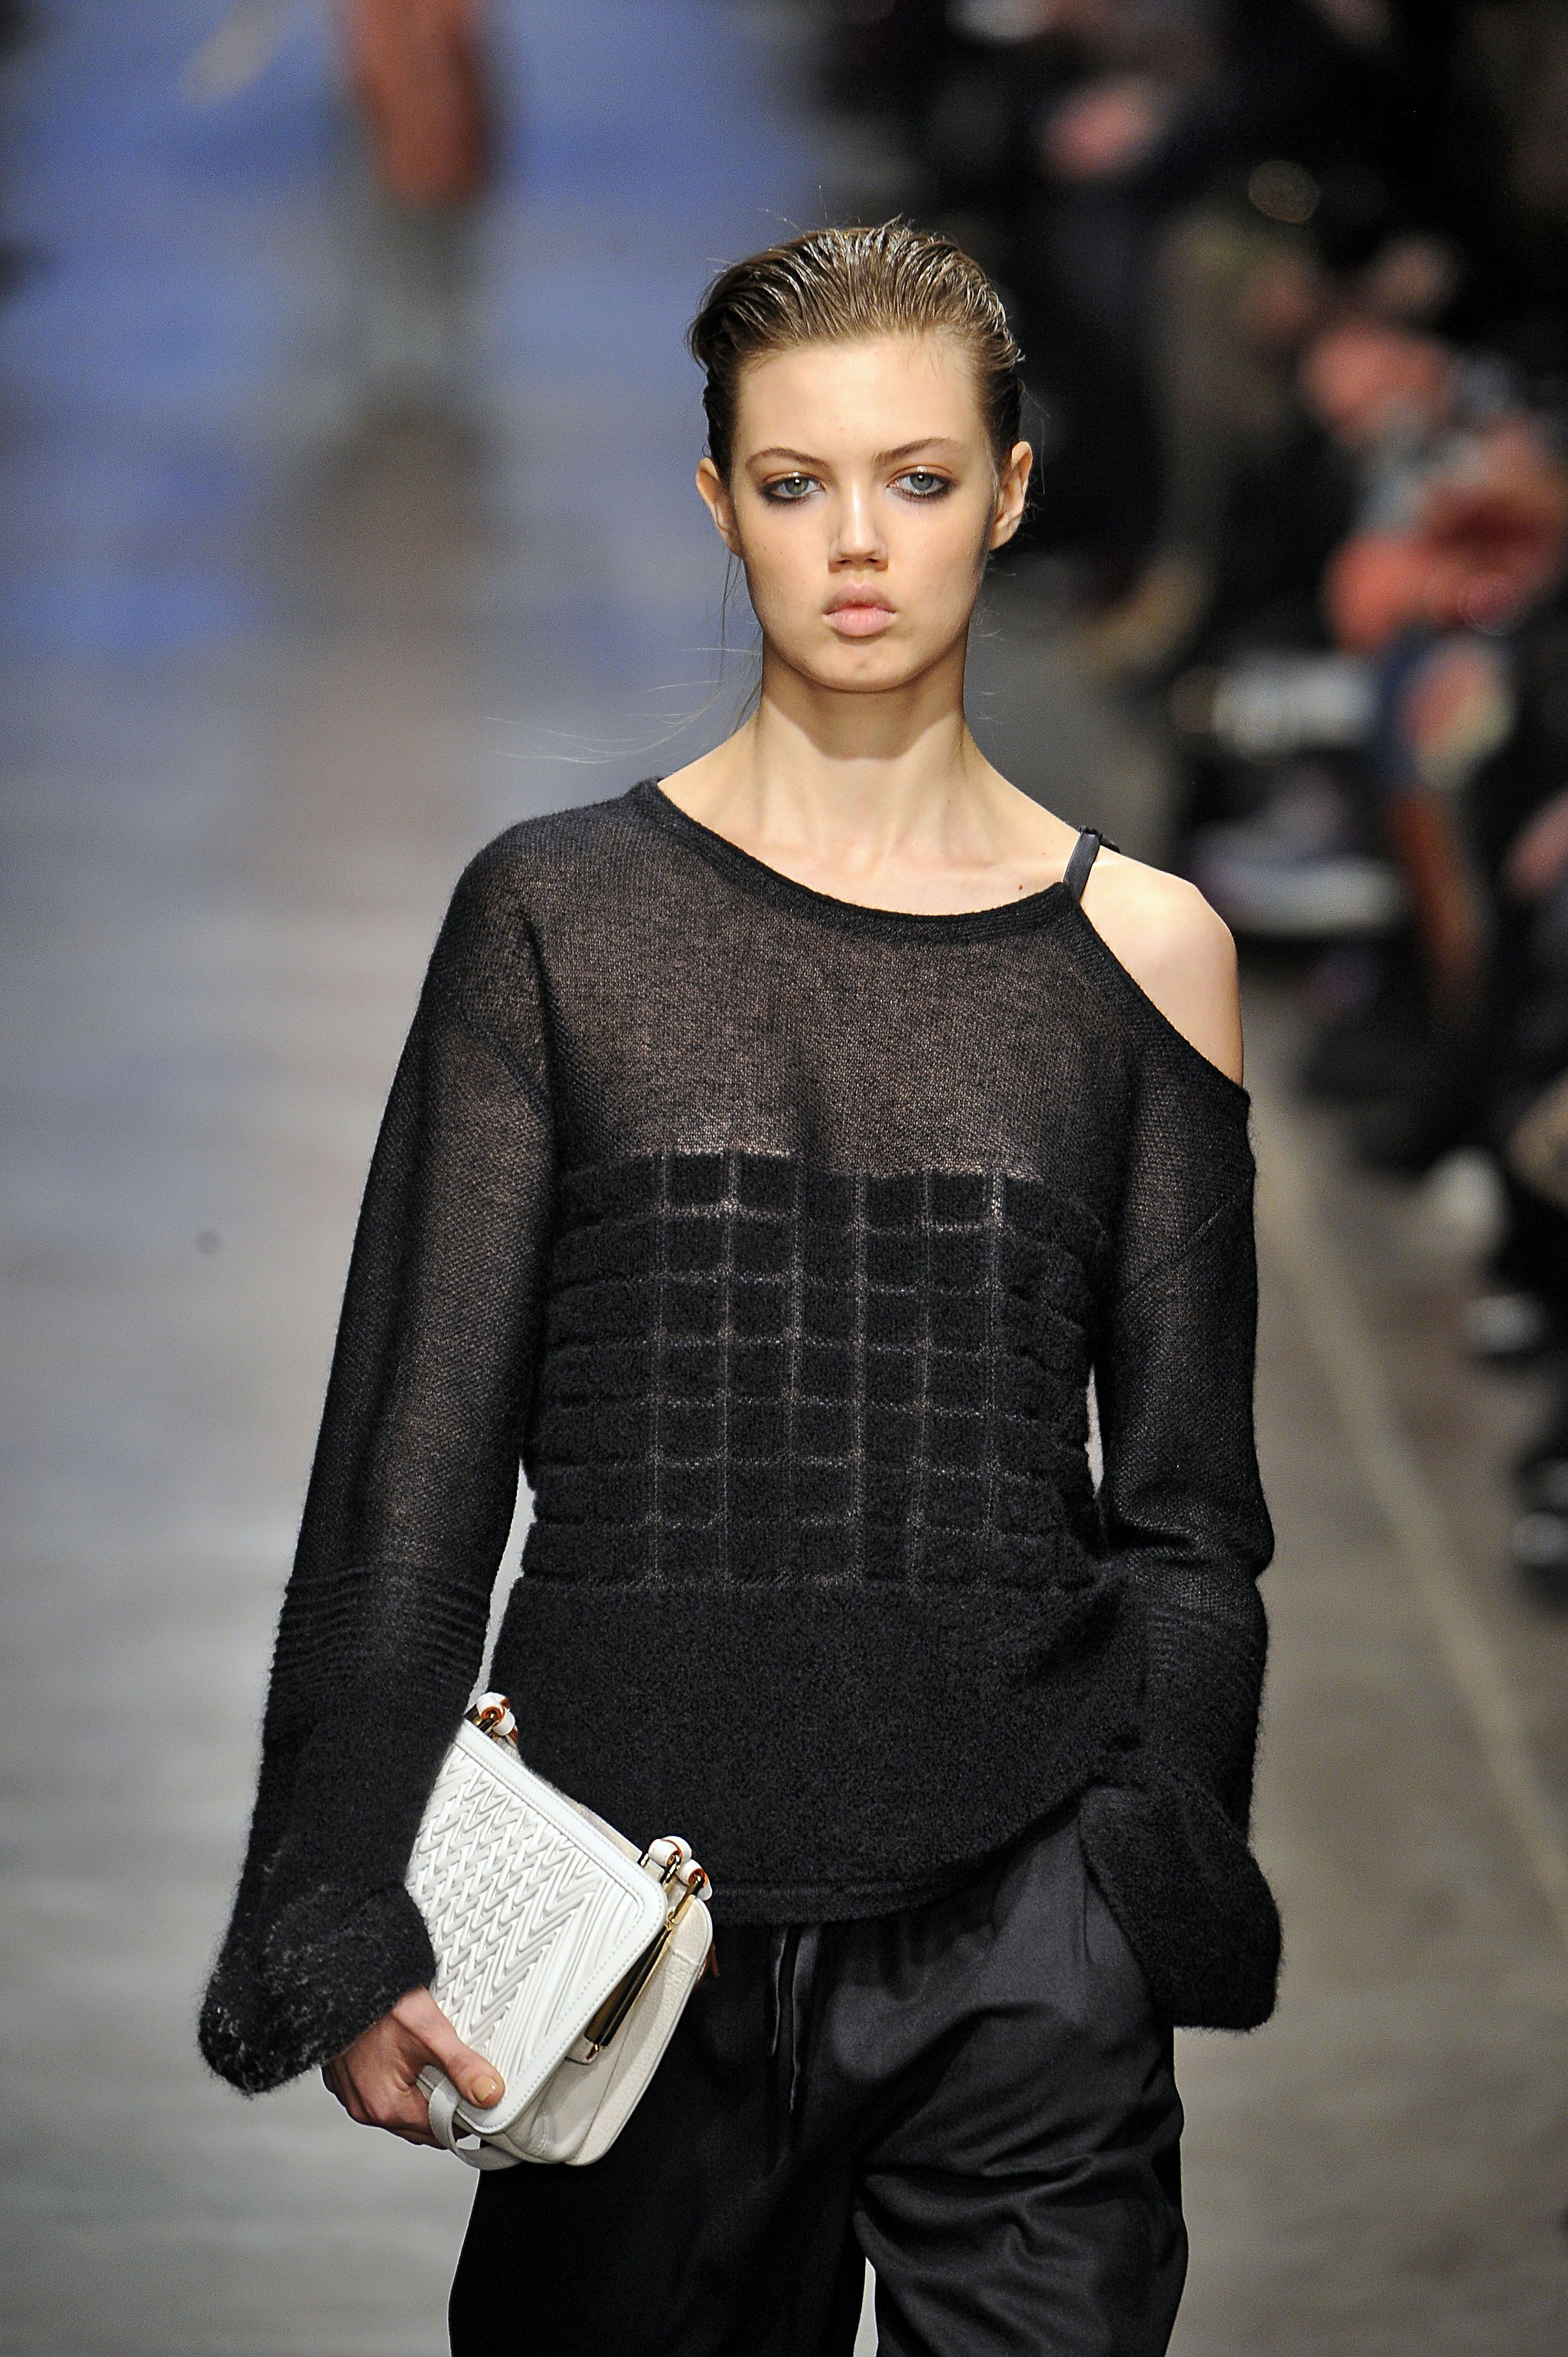 #Missoni - #Milan #Fashion #Week - like the should detail and asymmetric look